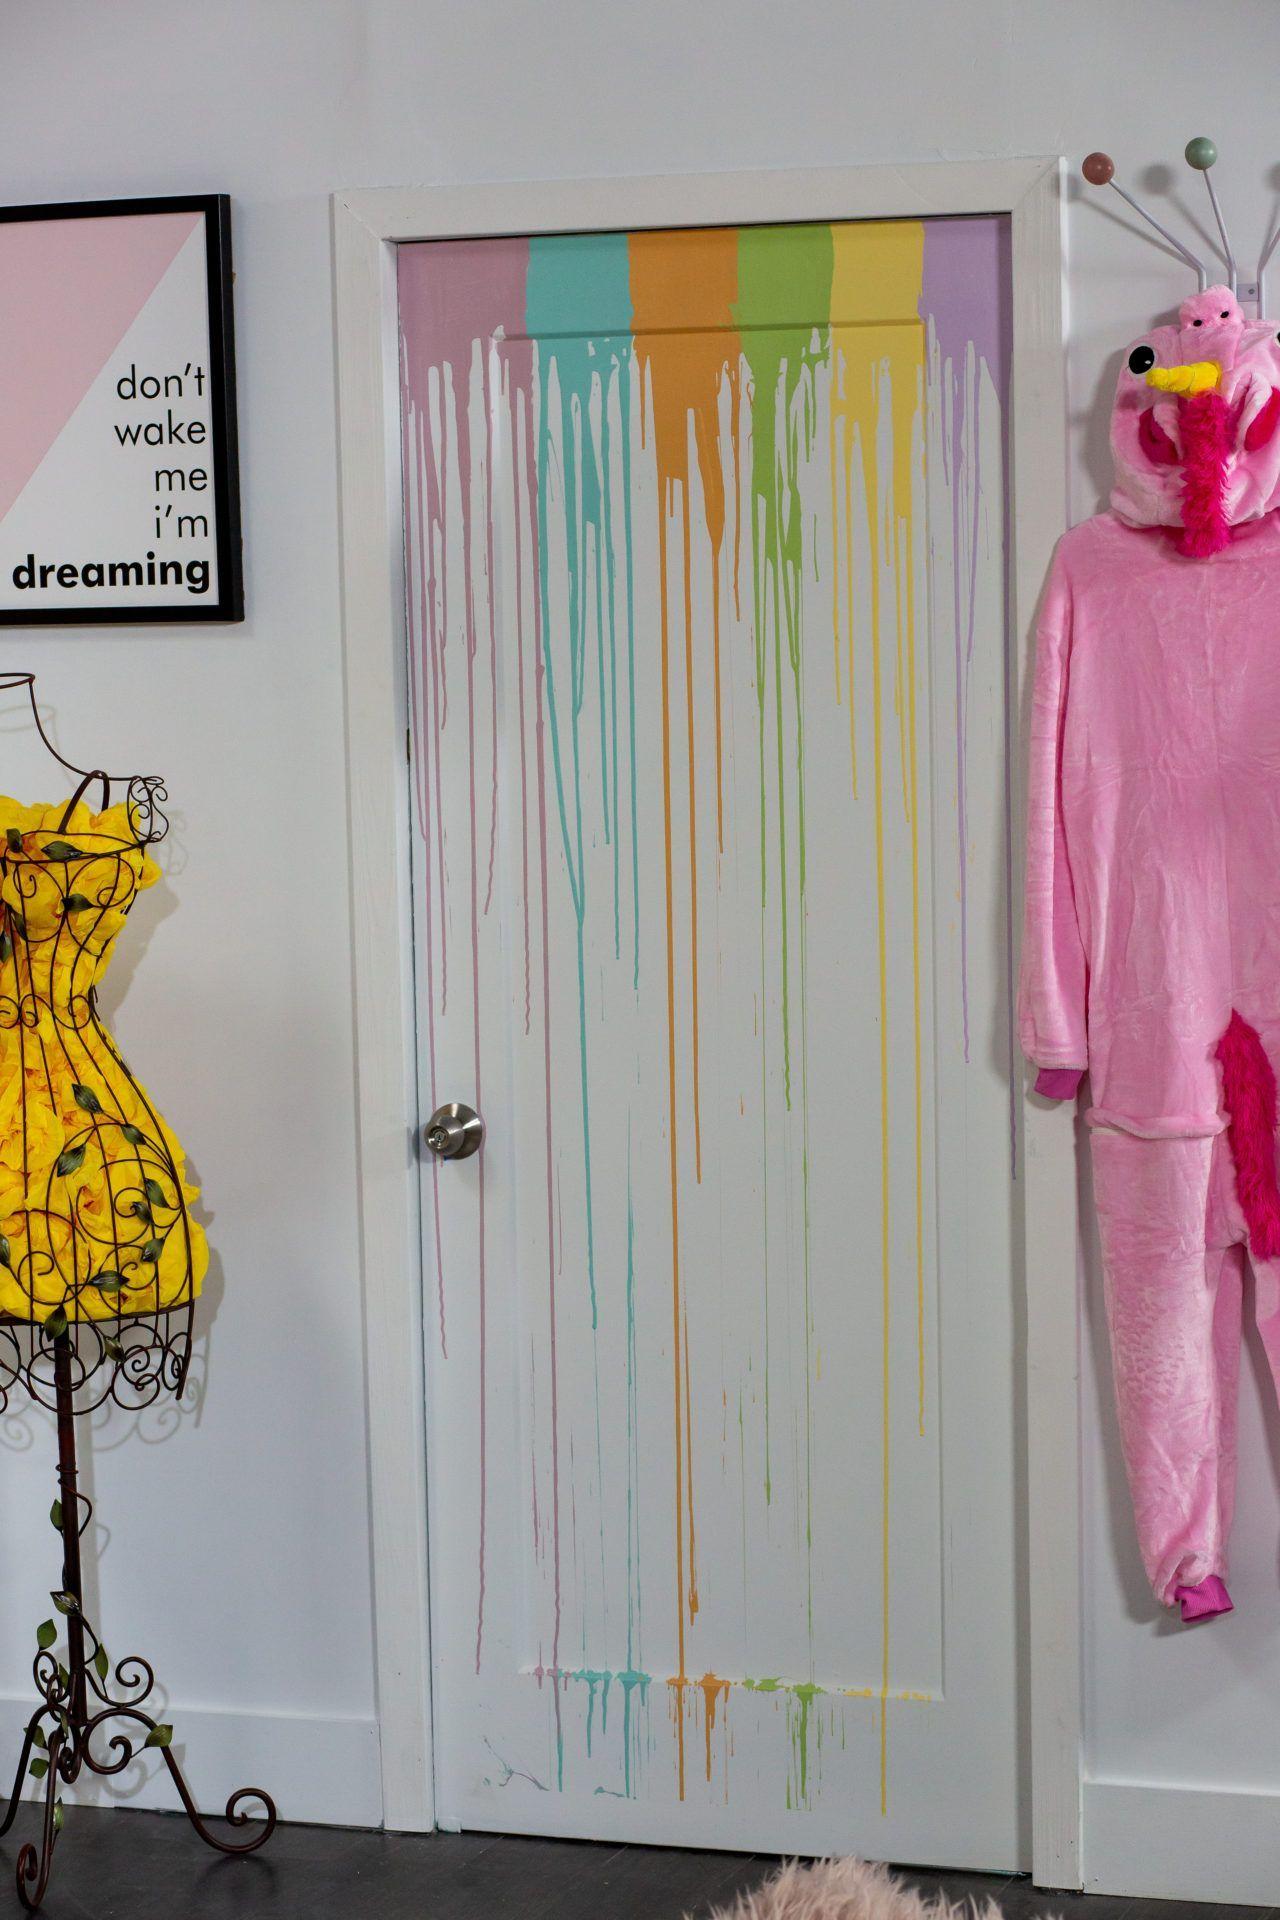 Kid Vs Kind Raum Design Challenge In 2020 Painted Bedroom Doors Bedroom Door Design Kids Room Design